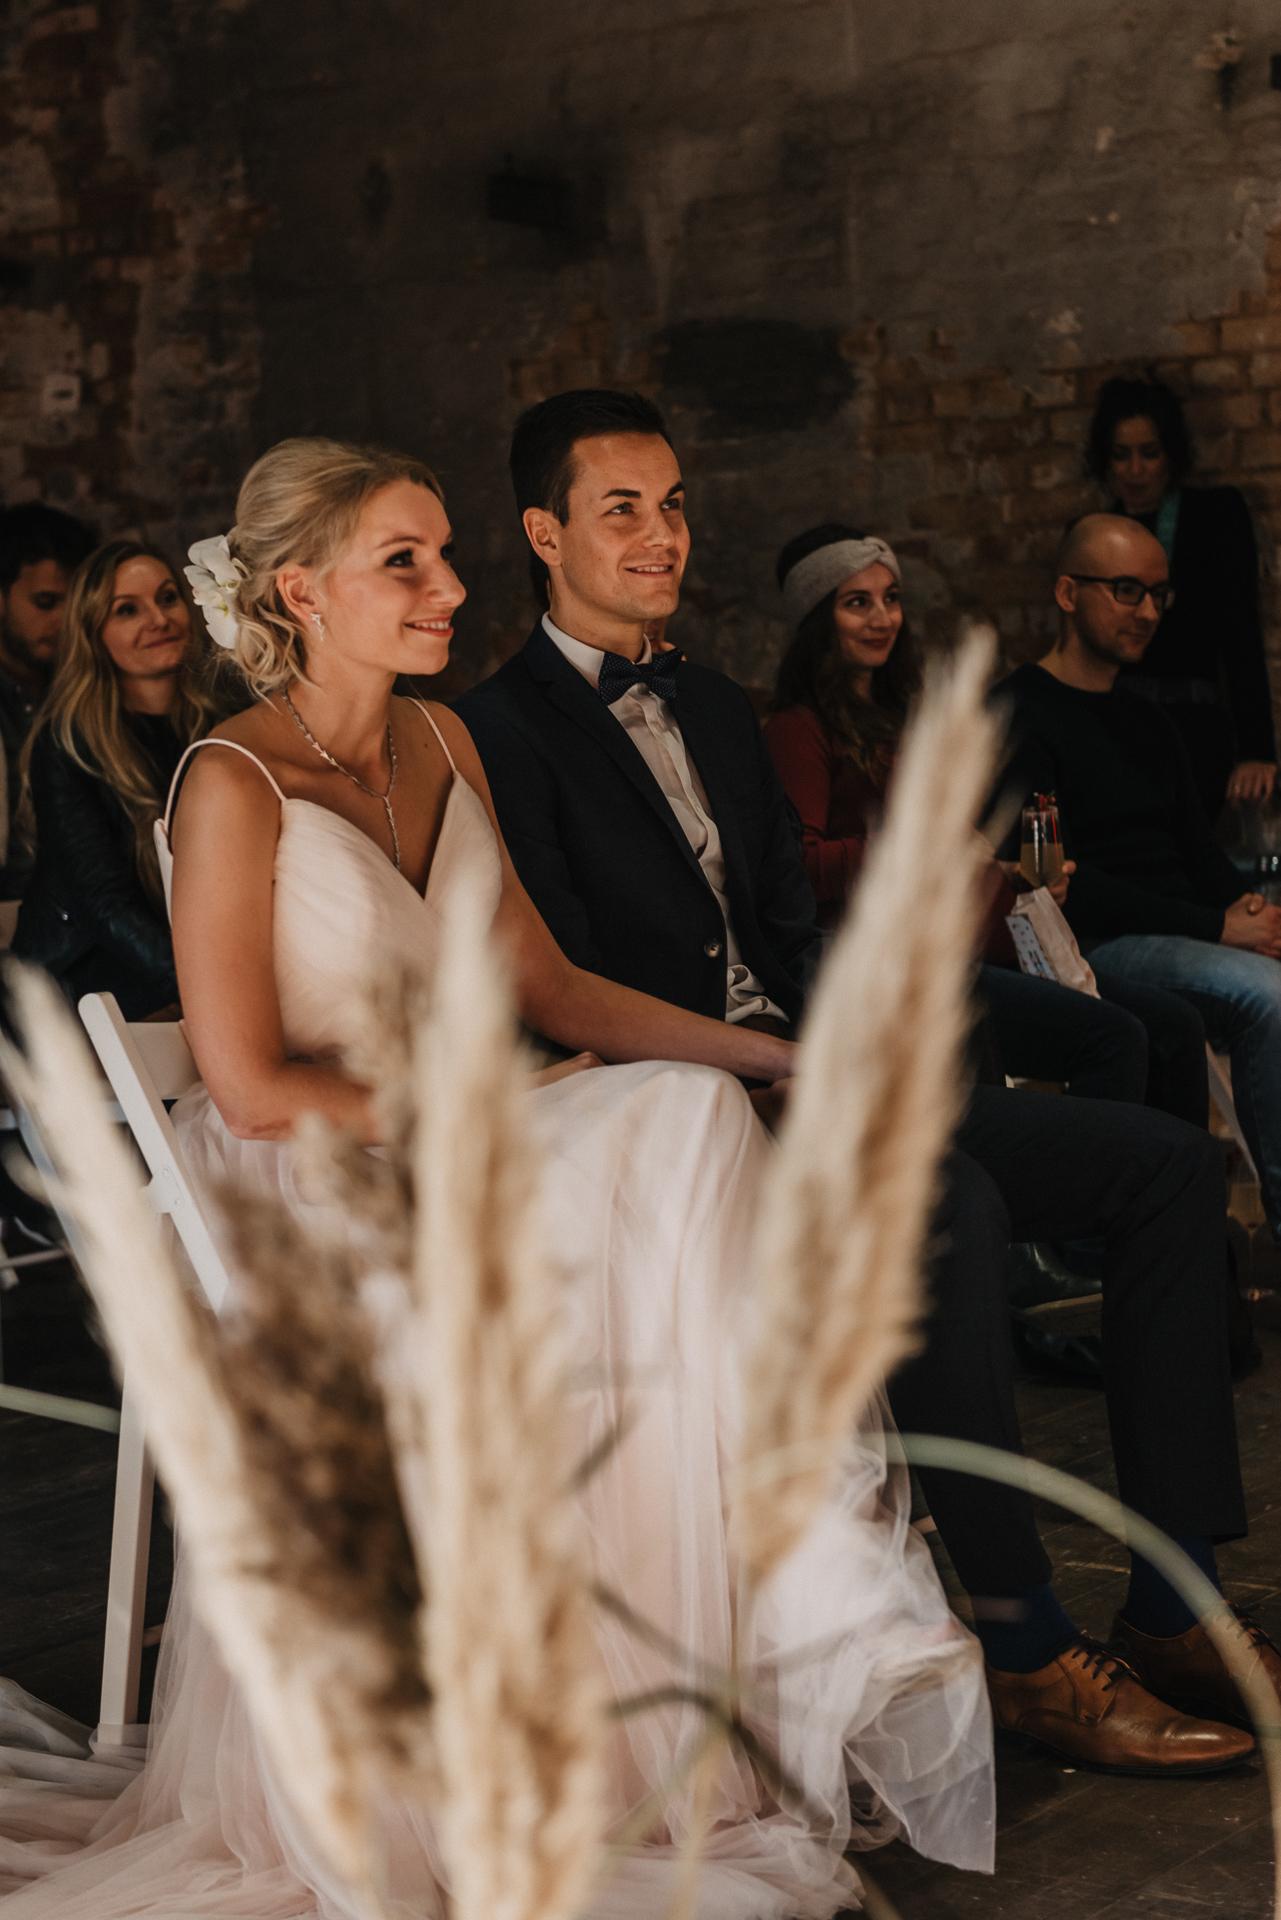 Zweinander-LeonoreHerzog-WeddingMarket-OnTour20191110-8879